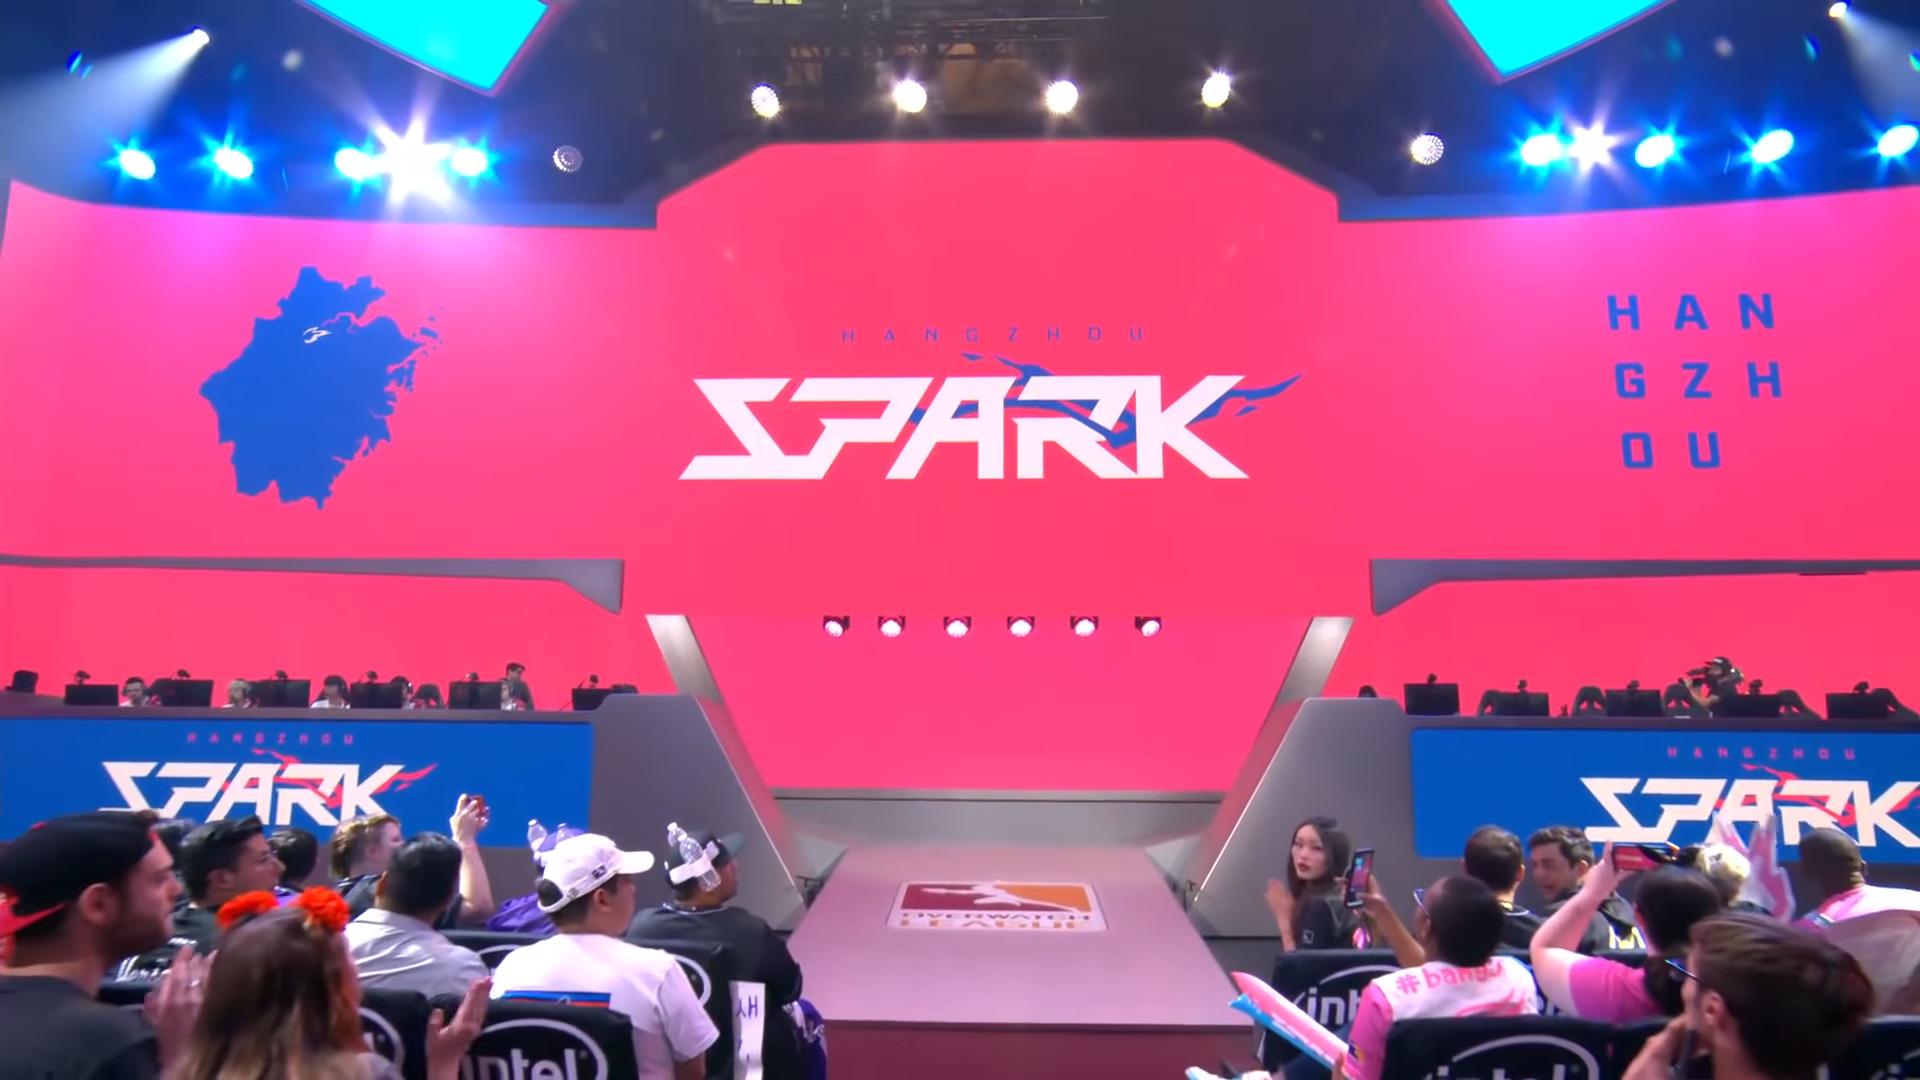 Owl Adora Ria Sasin Ado And Bebe Bids Farewell To The Hangzhou Spark Happy Gamer